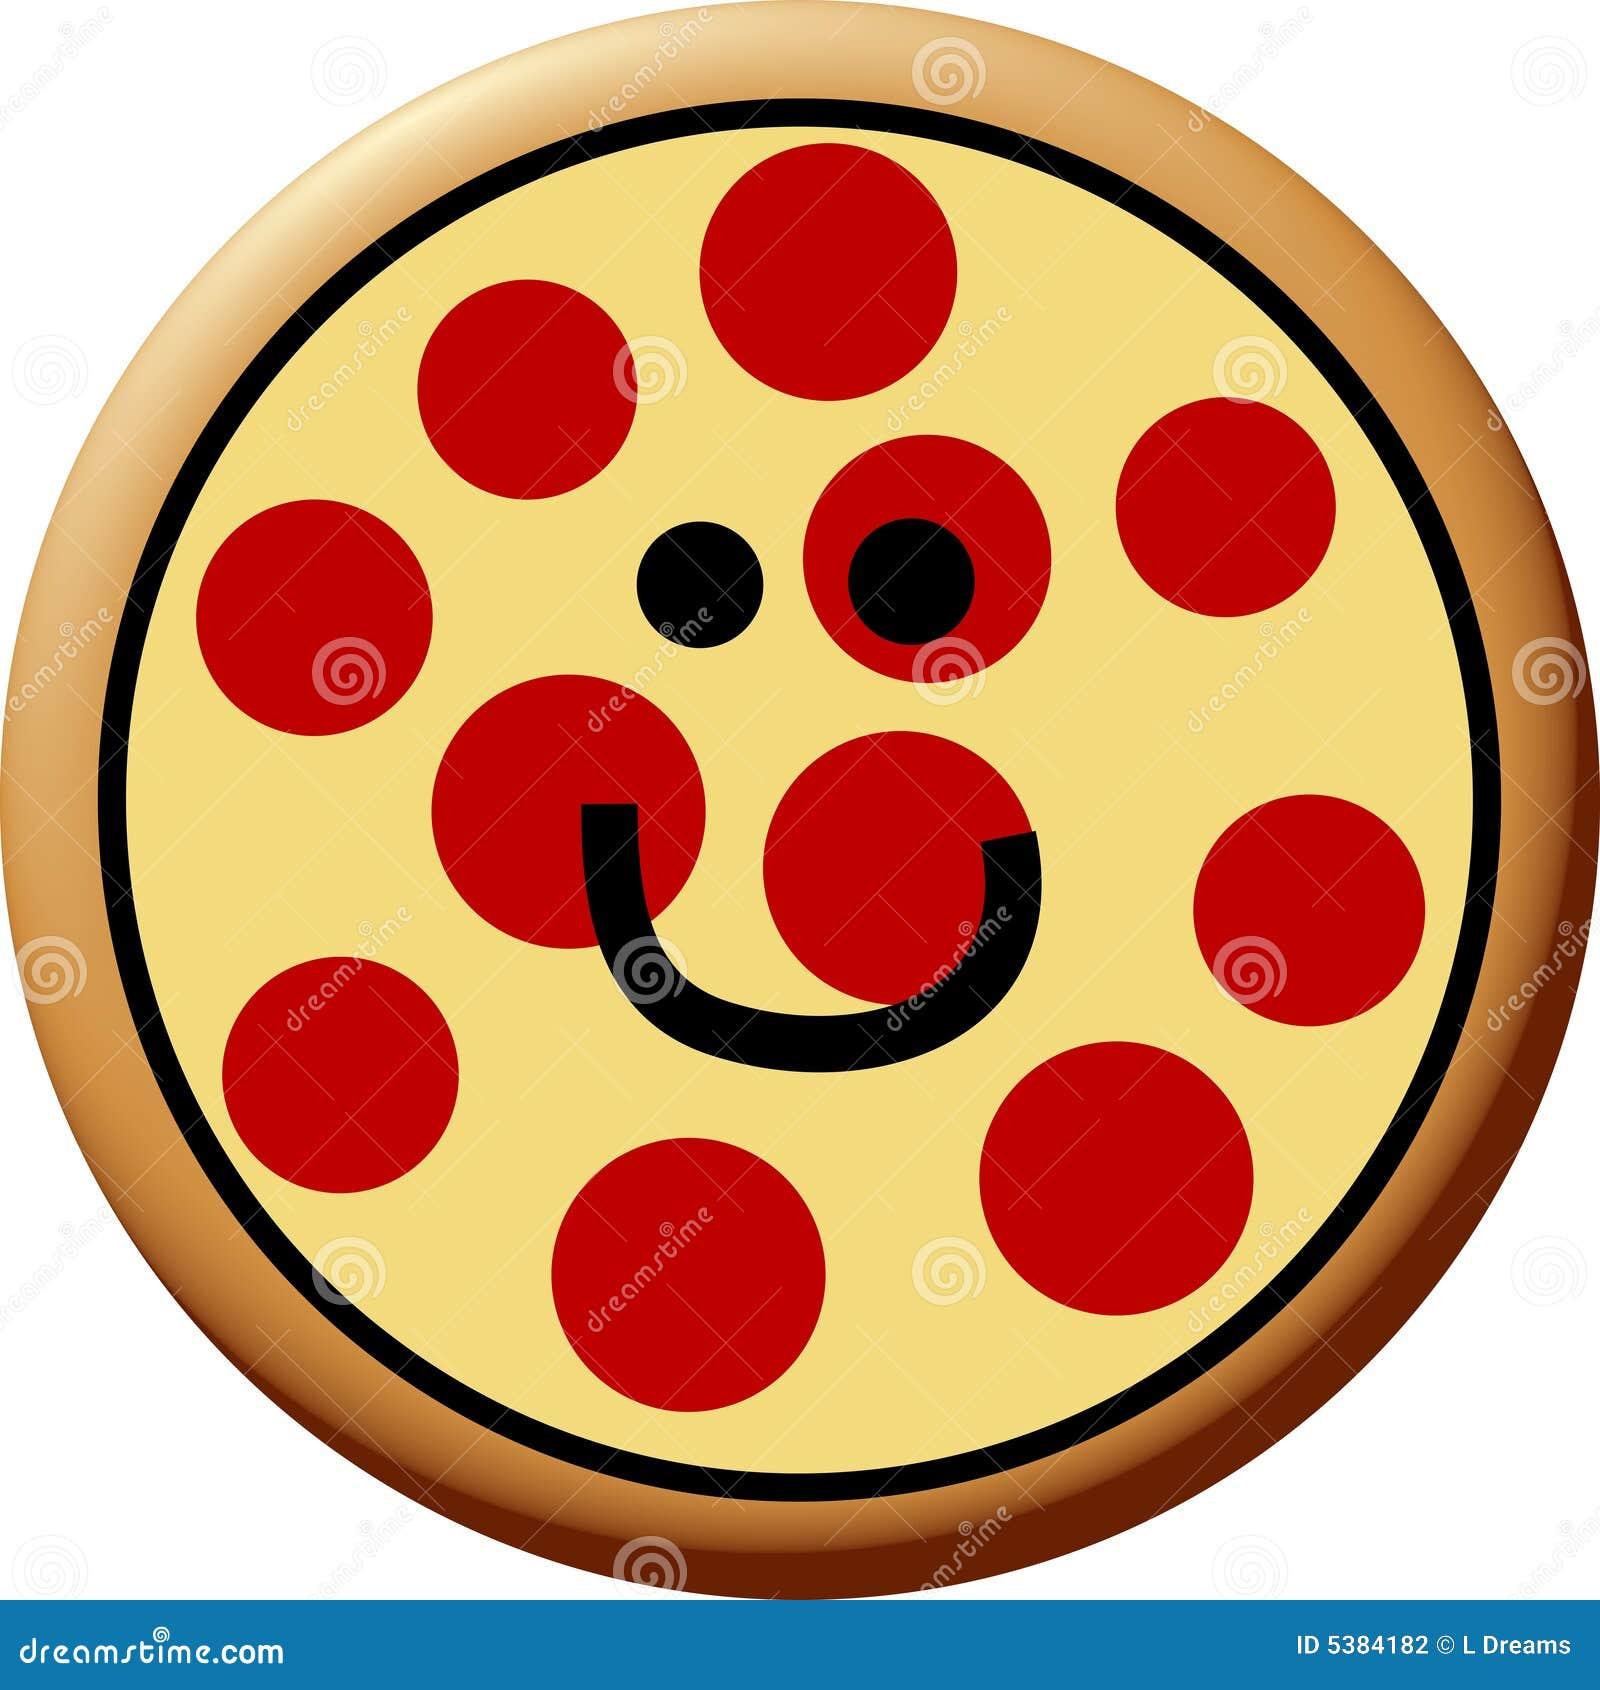 happy pepperoni pizza stock illustration illustration of meal 5384182 rh dreamstime com pepperoni pizza slice clipart Pepperoni Slice Clip Art